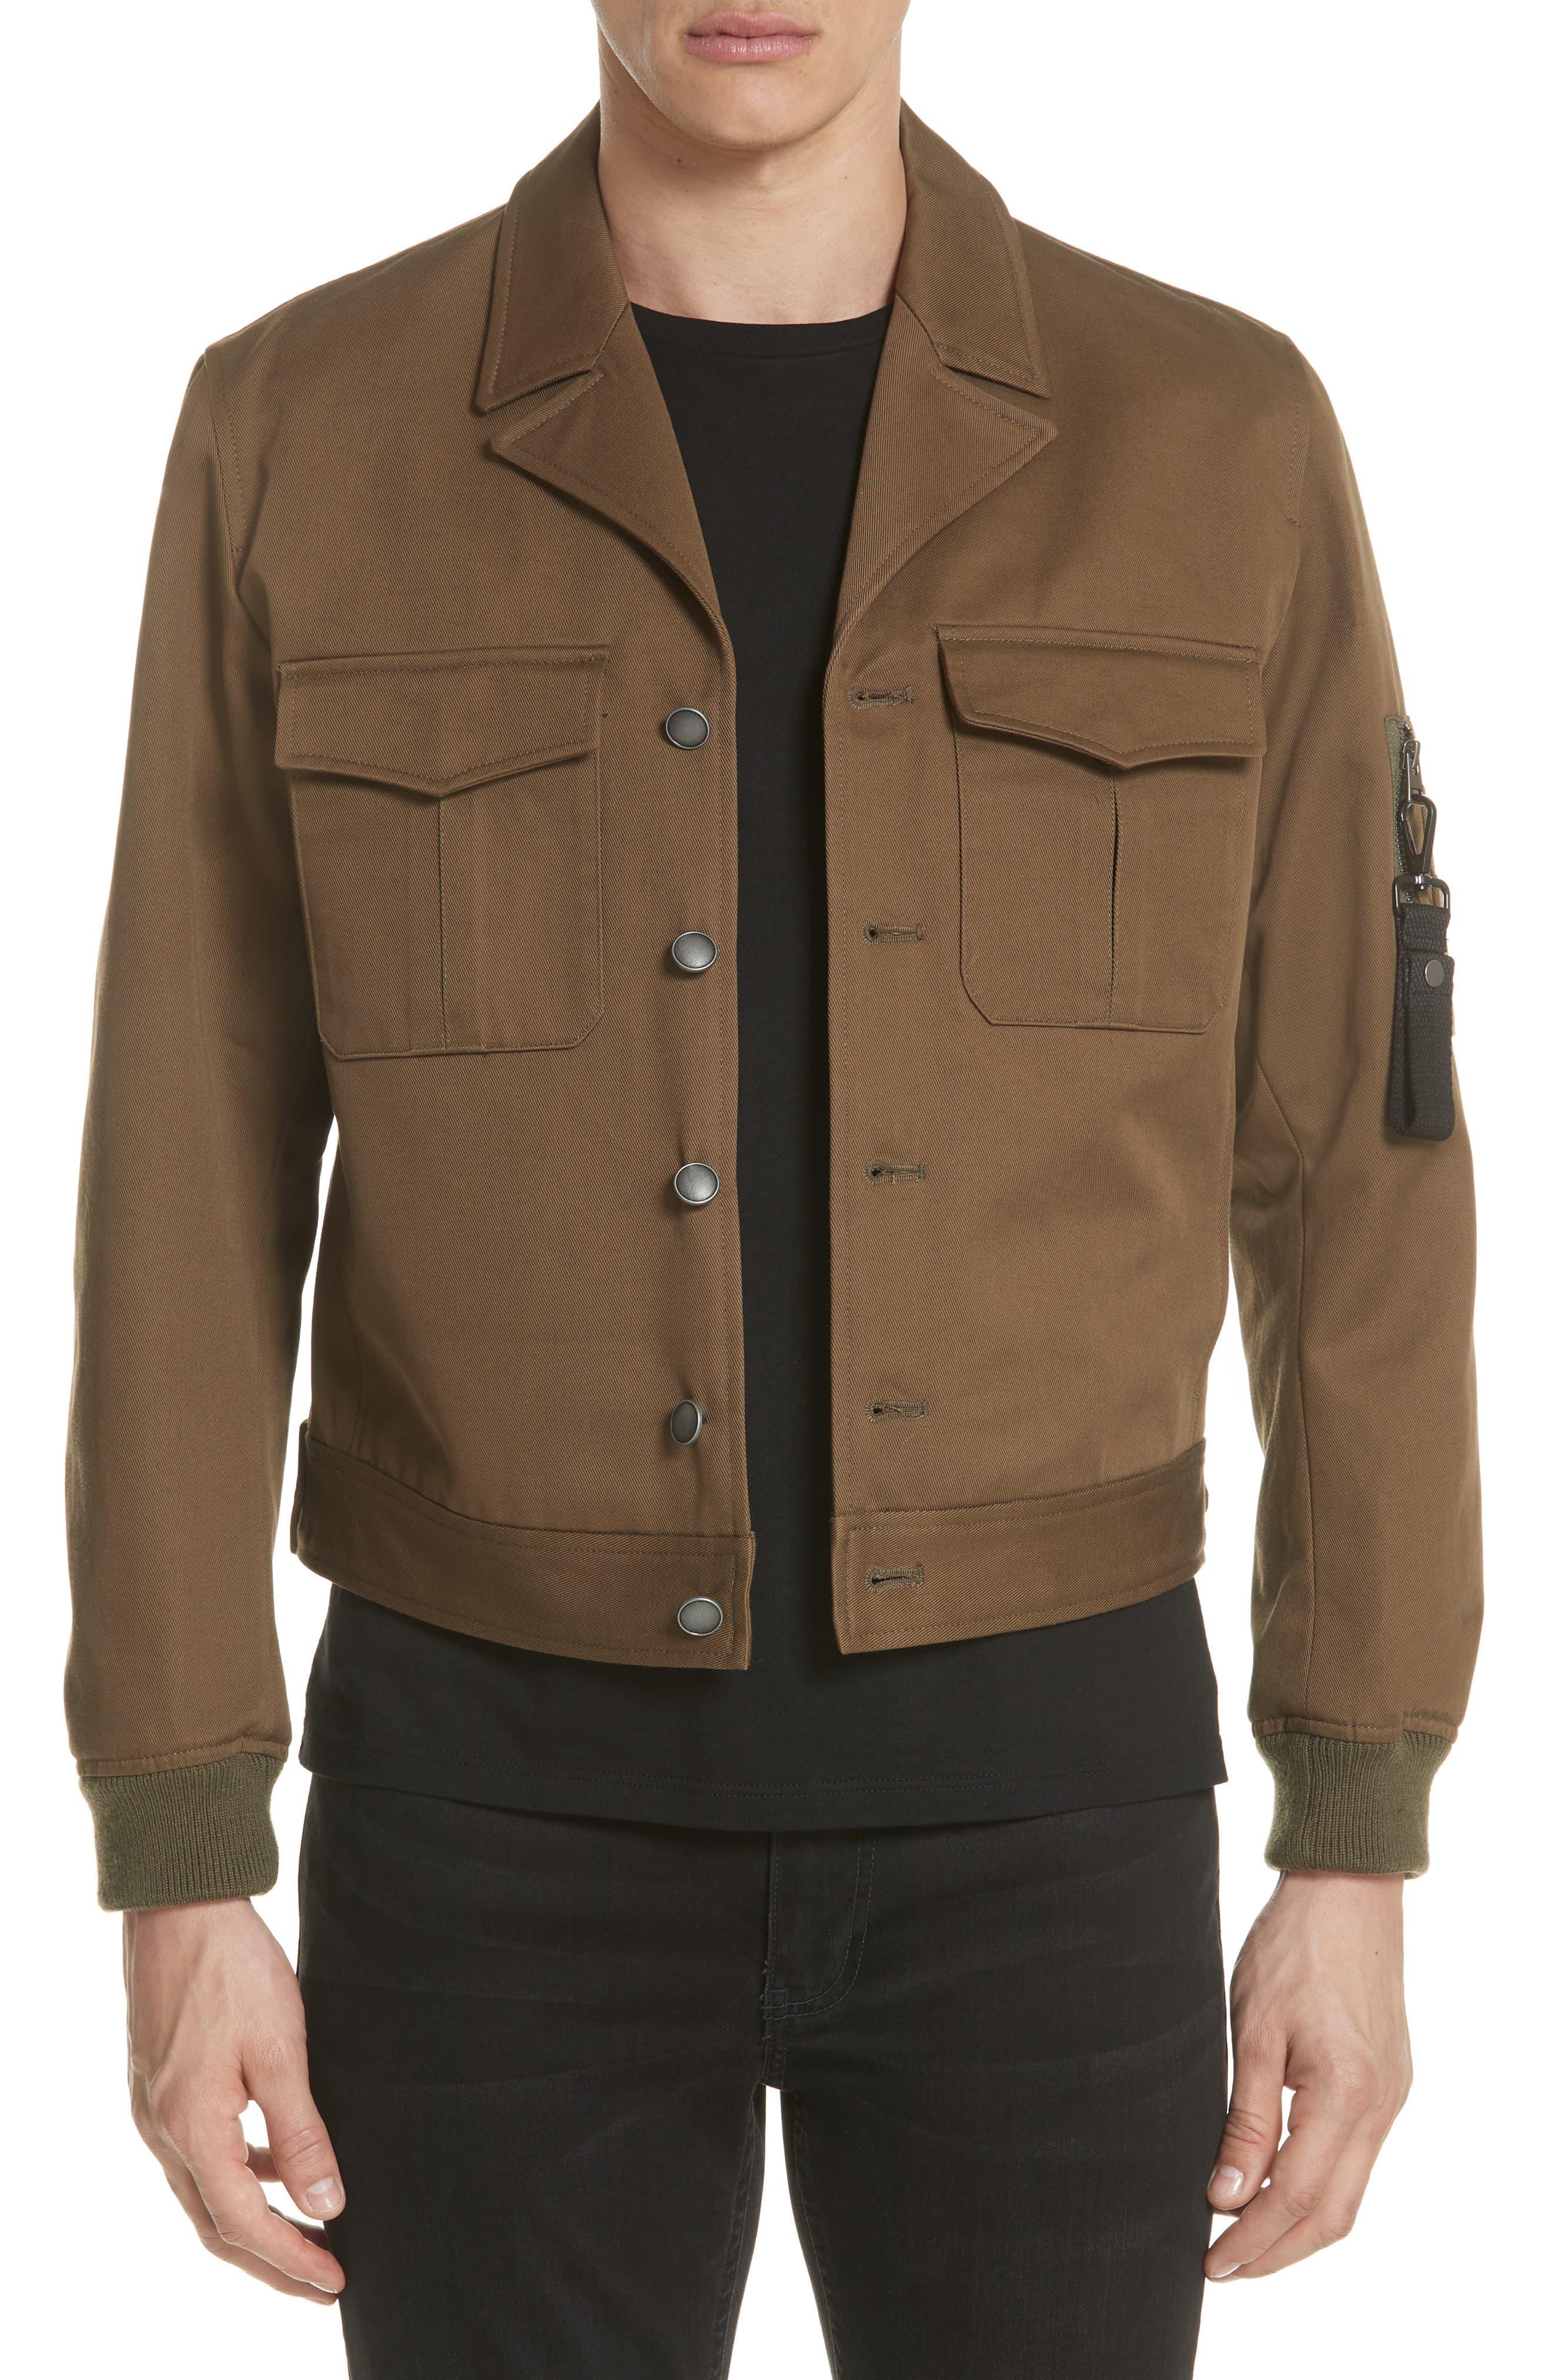 The Kooples Military Bomber Jacket